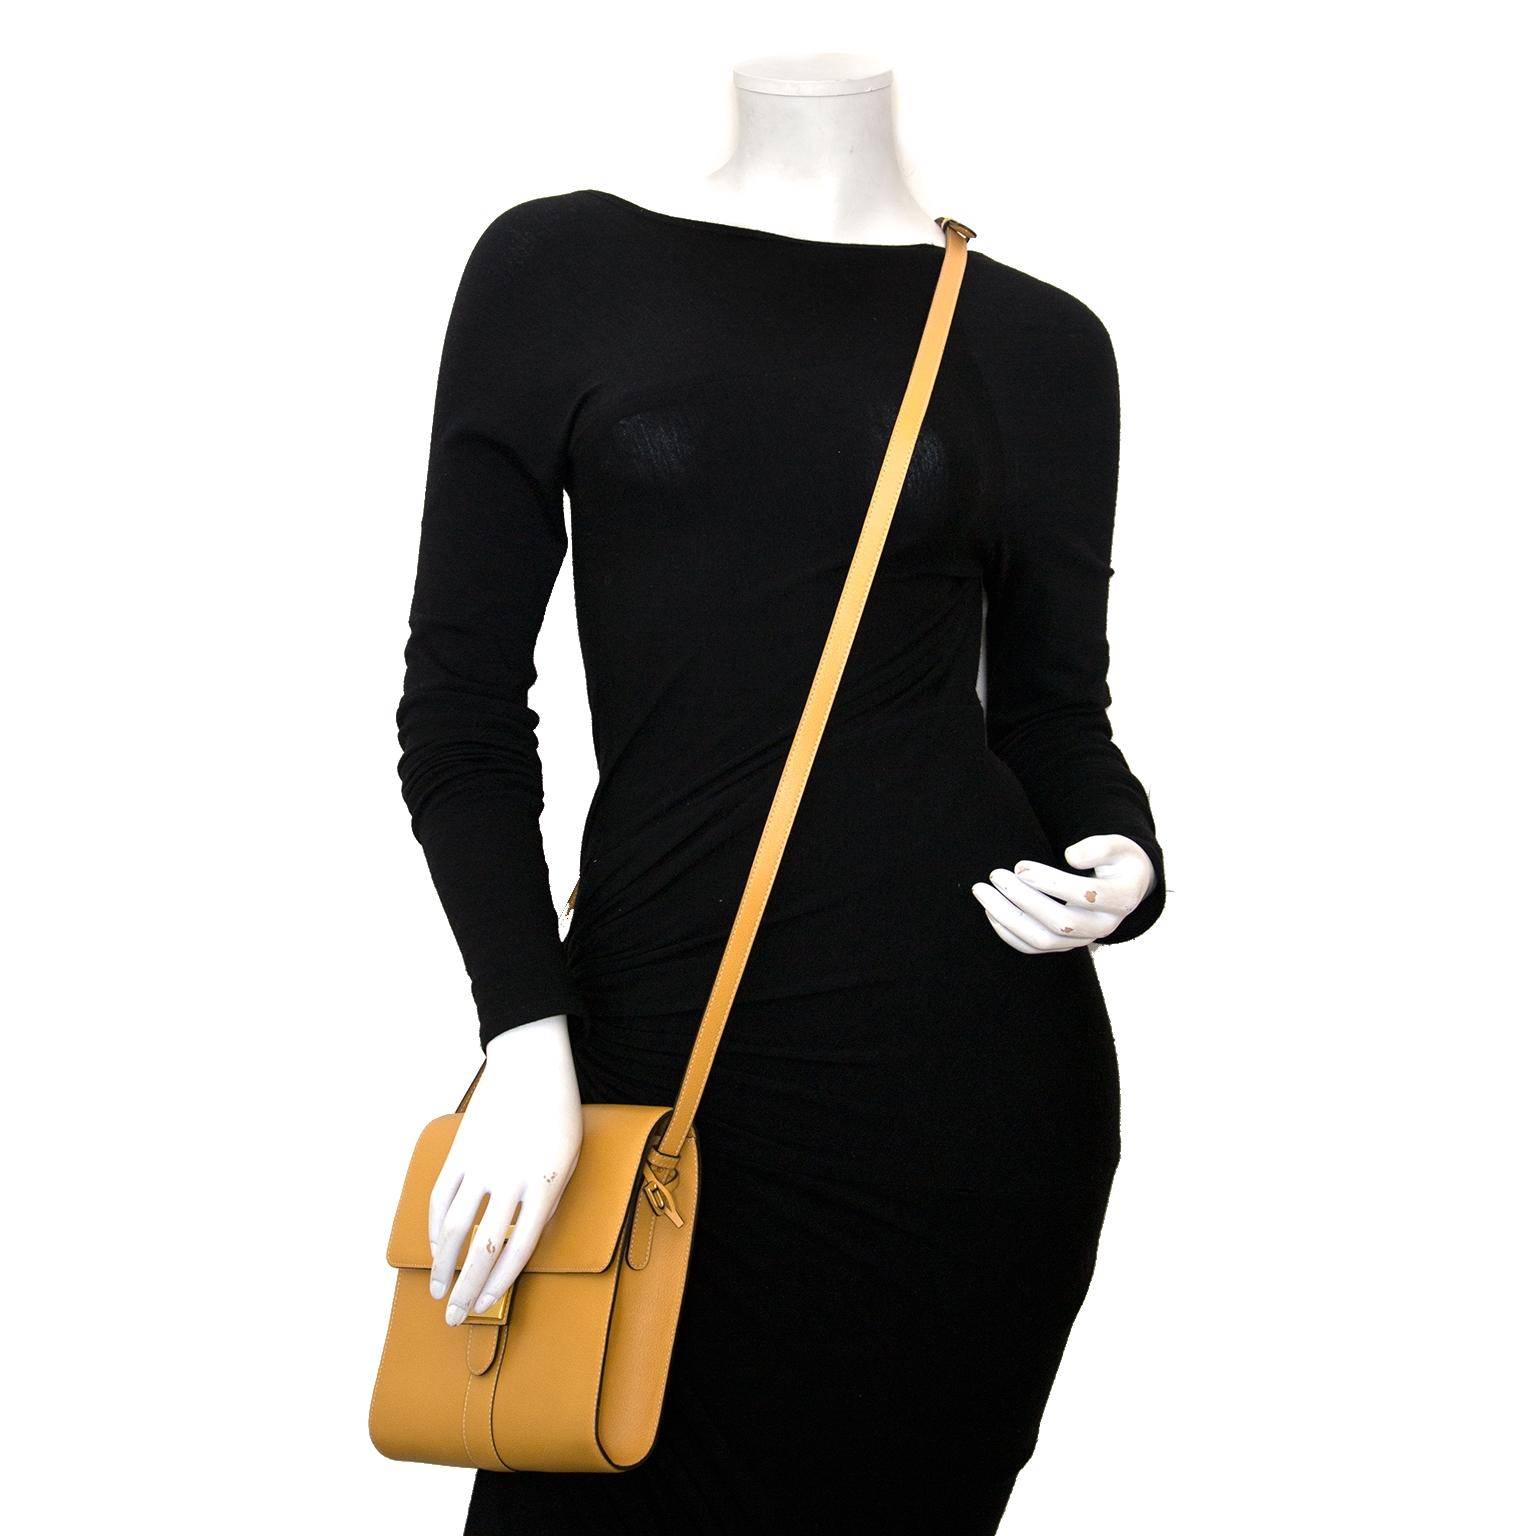 79c368fbfd68 ... Authentic Delvaux bag for sale online at Labellov secondhand vintage